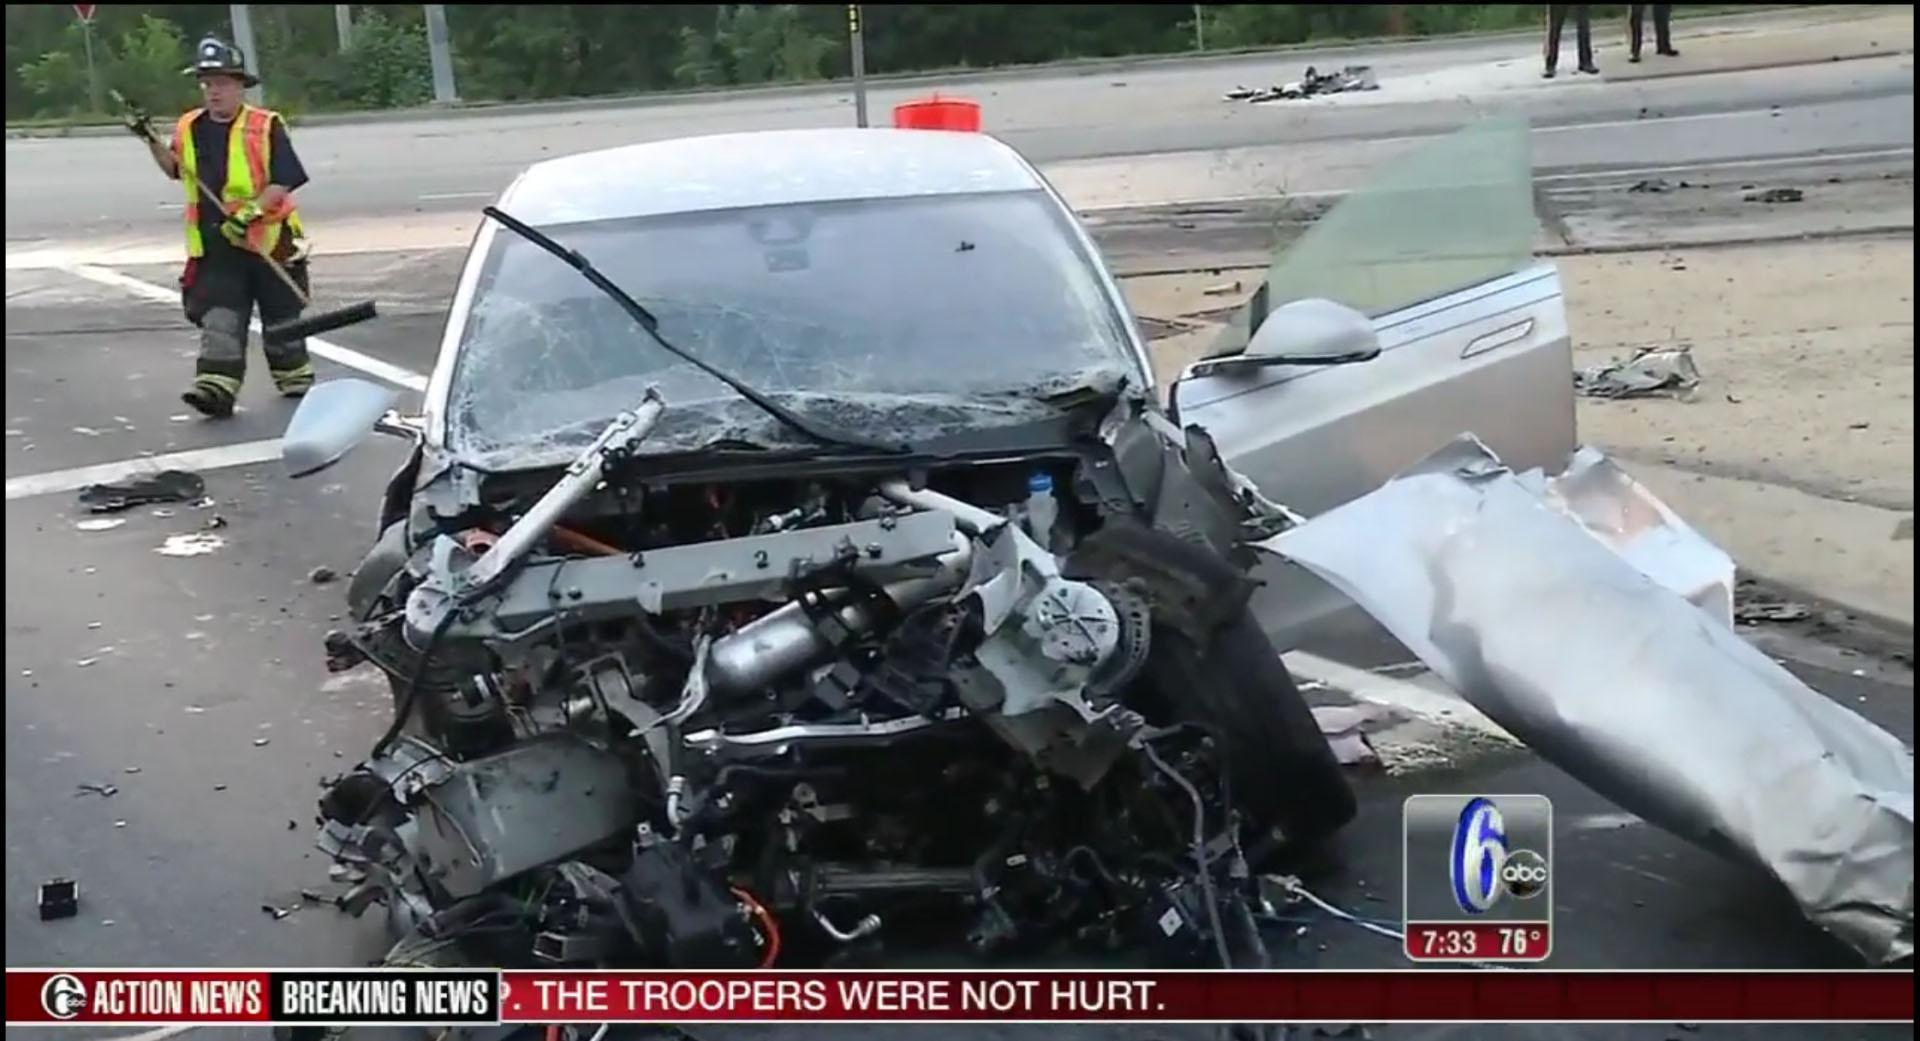 18 Wheeler For Sale >> Video Vixen Melyssa Ford Fractures Skull in Horrific Crash, Survives - autoevolution